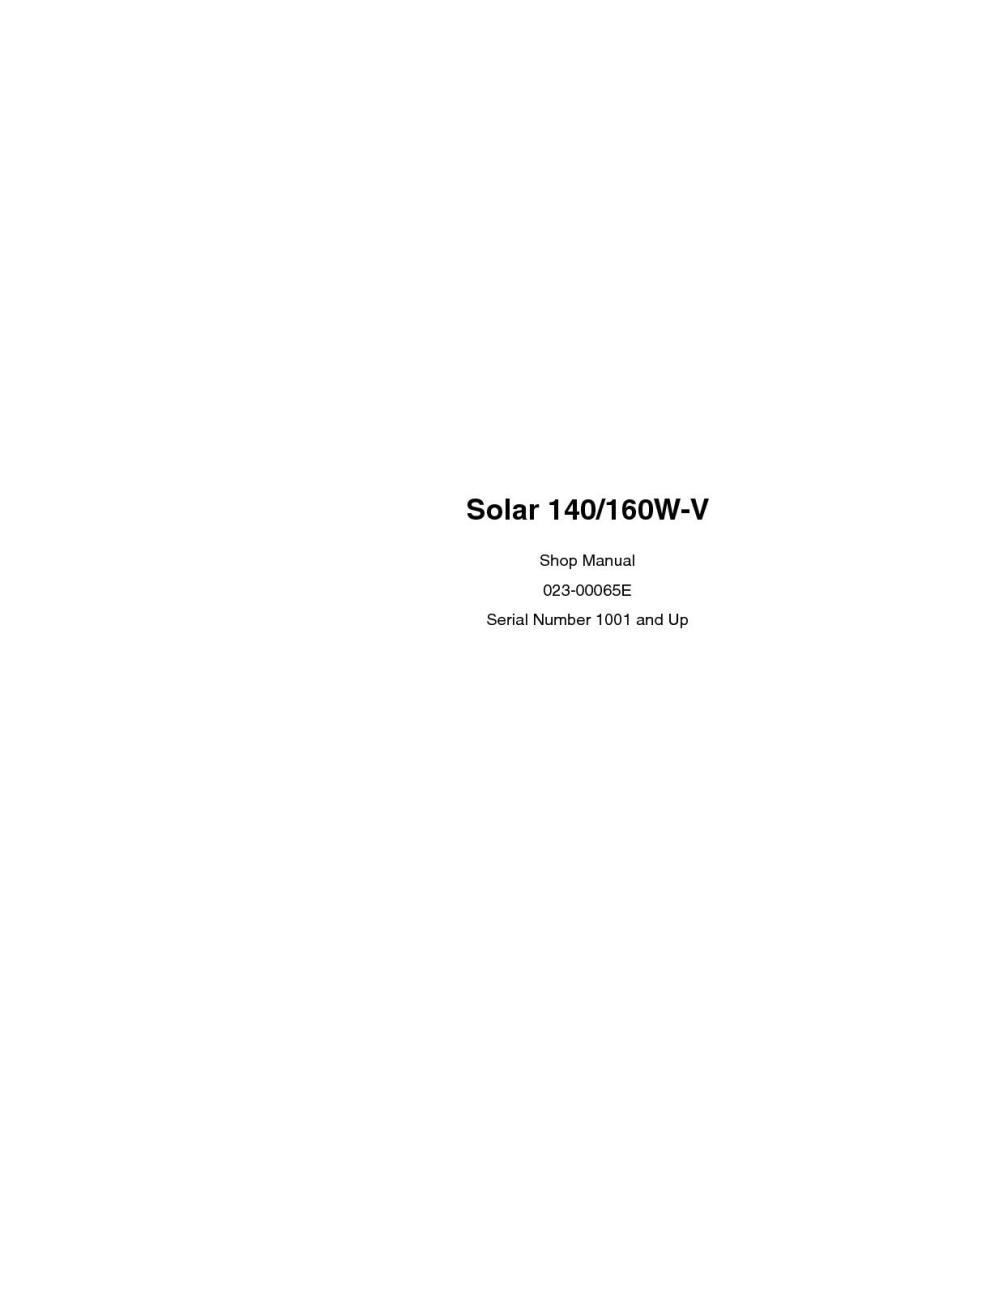 medium resolution of daewoo doosan solar 140w v wheel excavator service repair manual